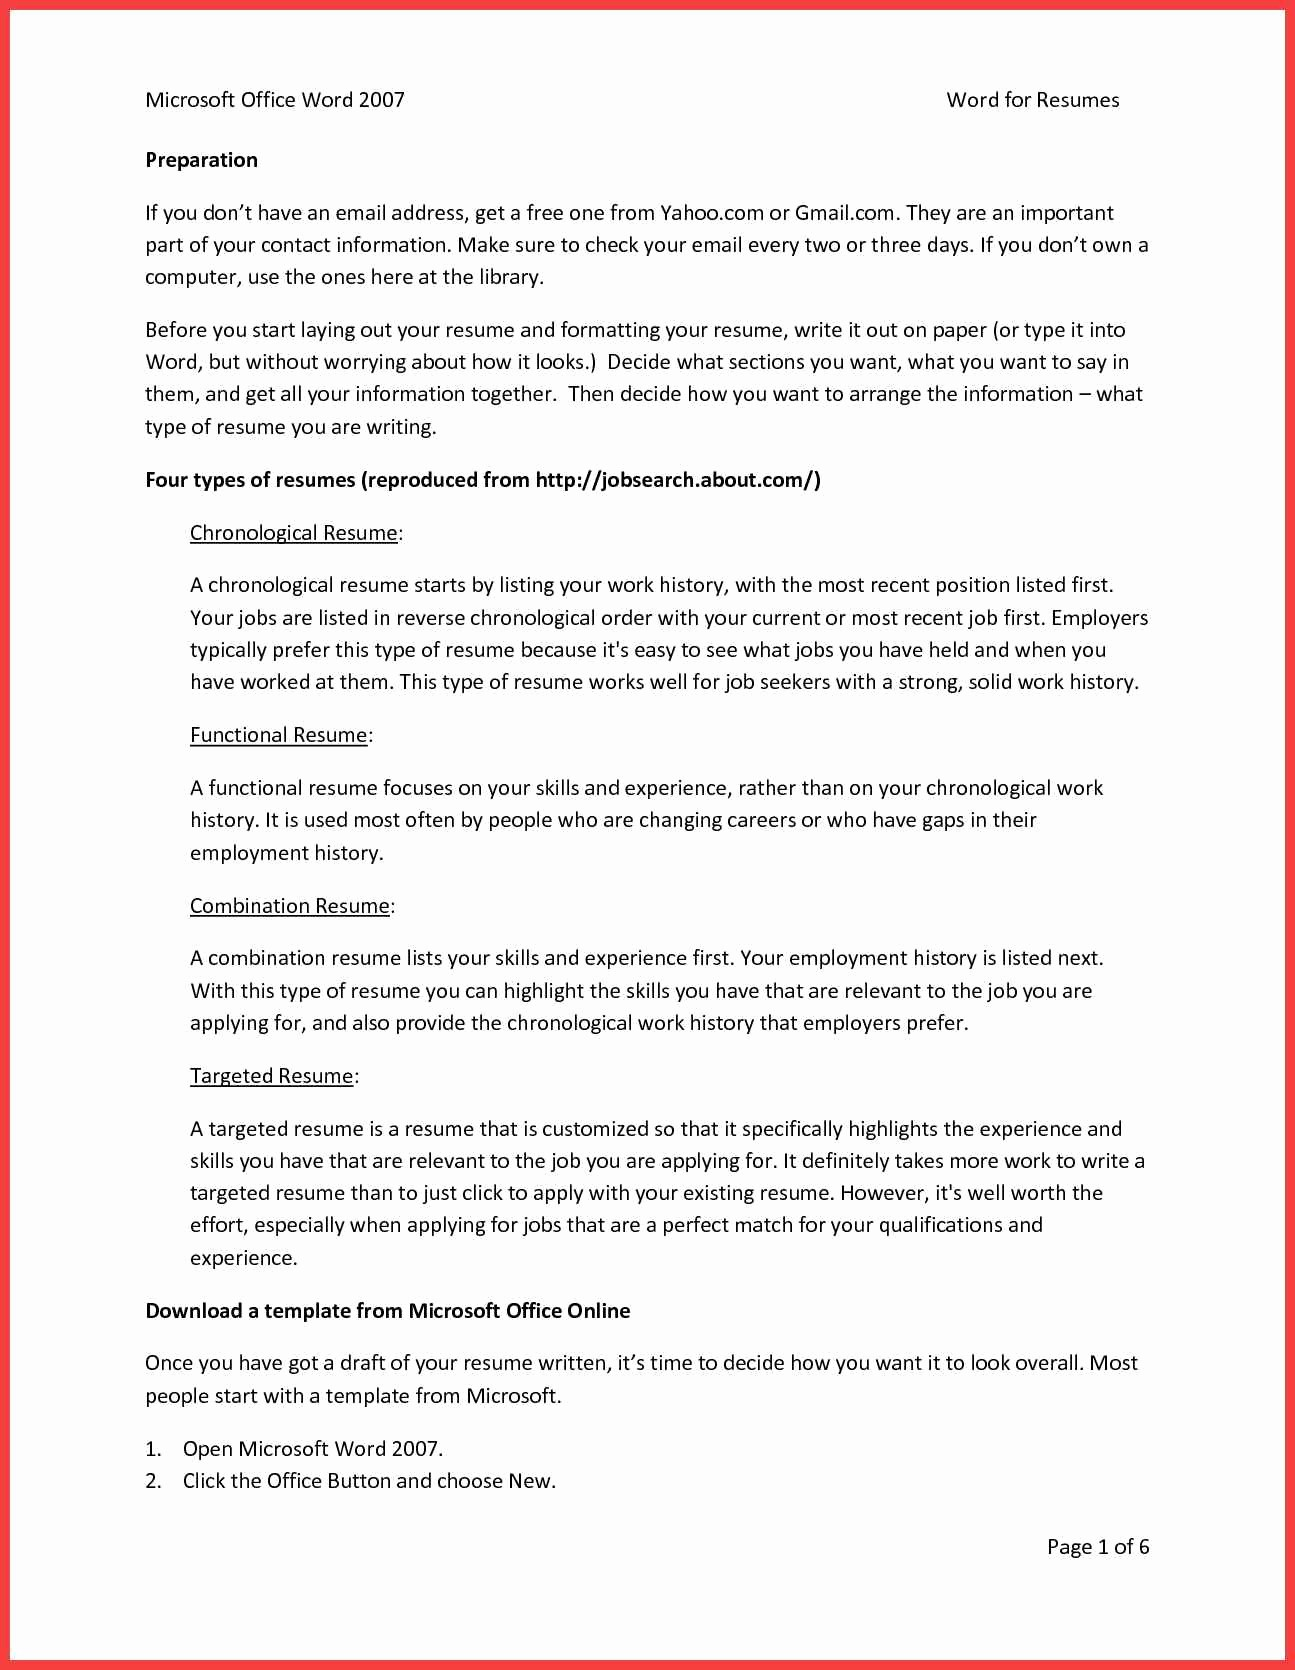 Microsoft Word 2007 Resume Templates Lovely Skills Resume Template Word